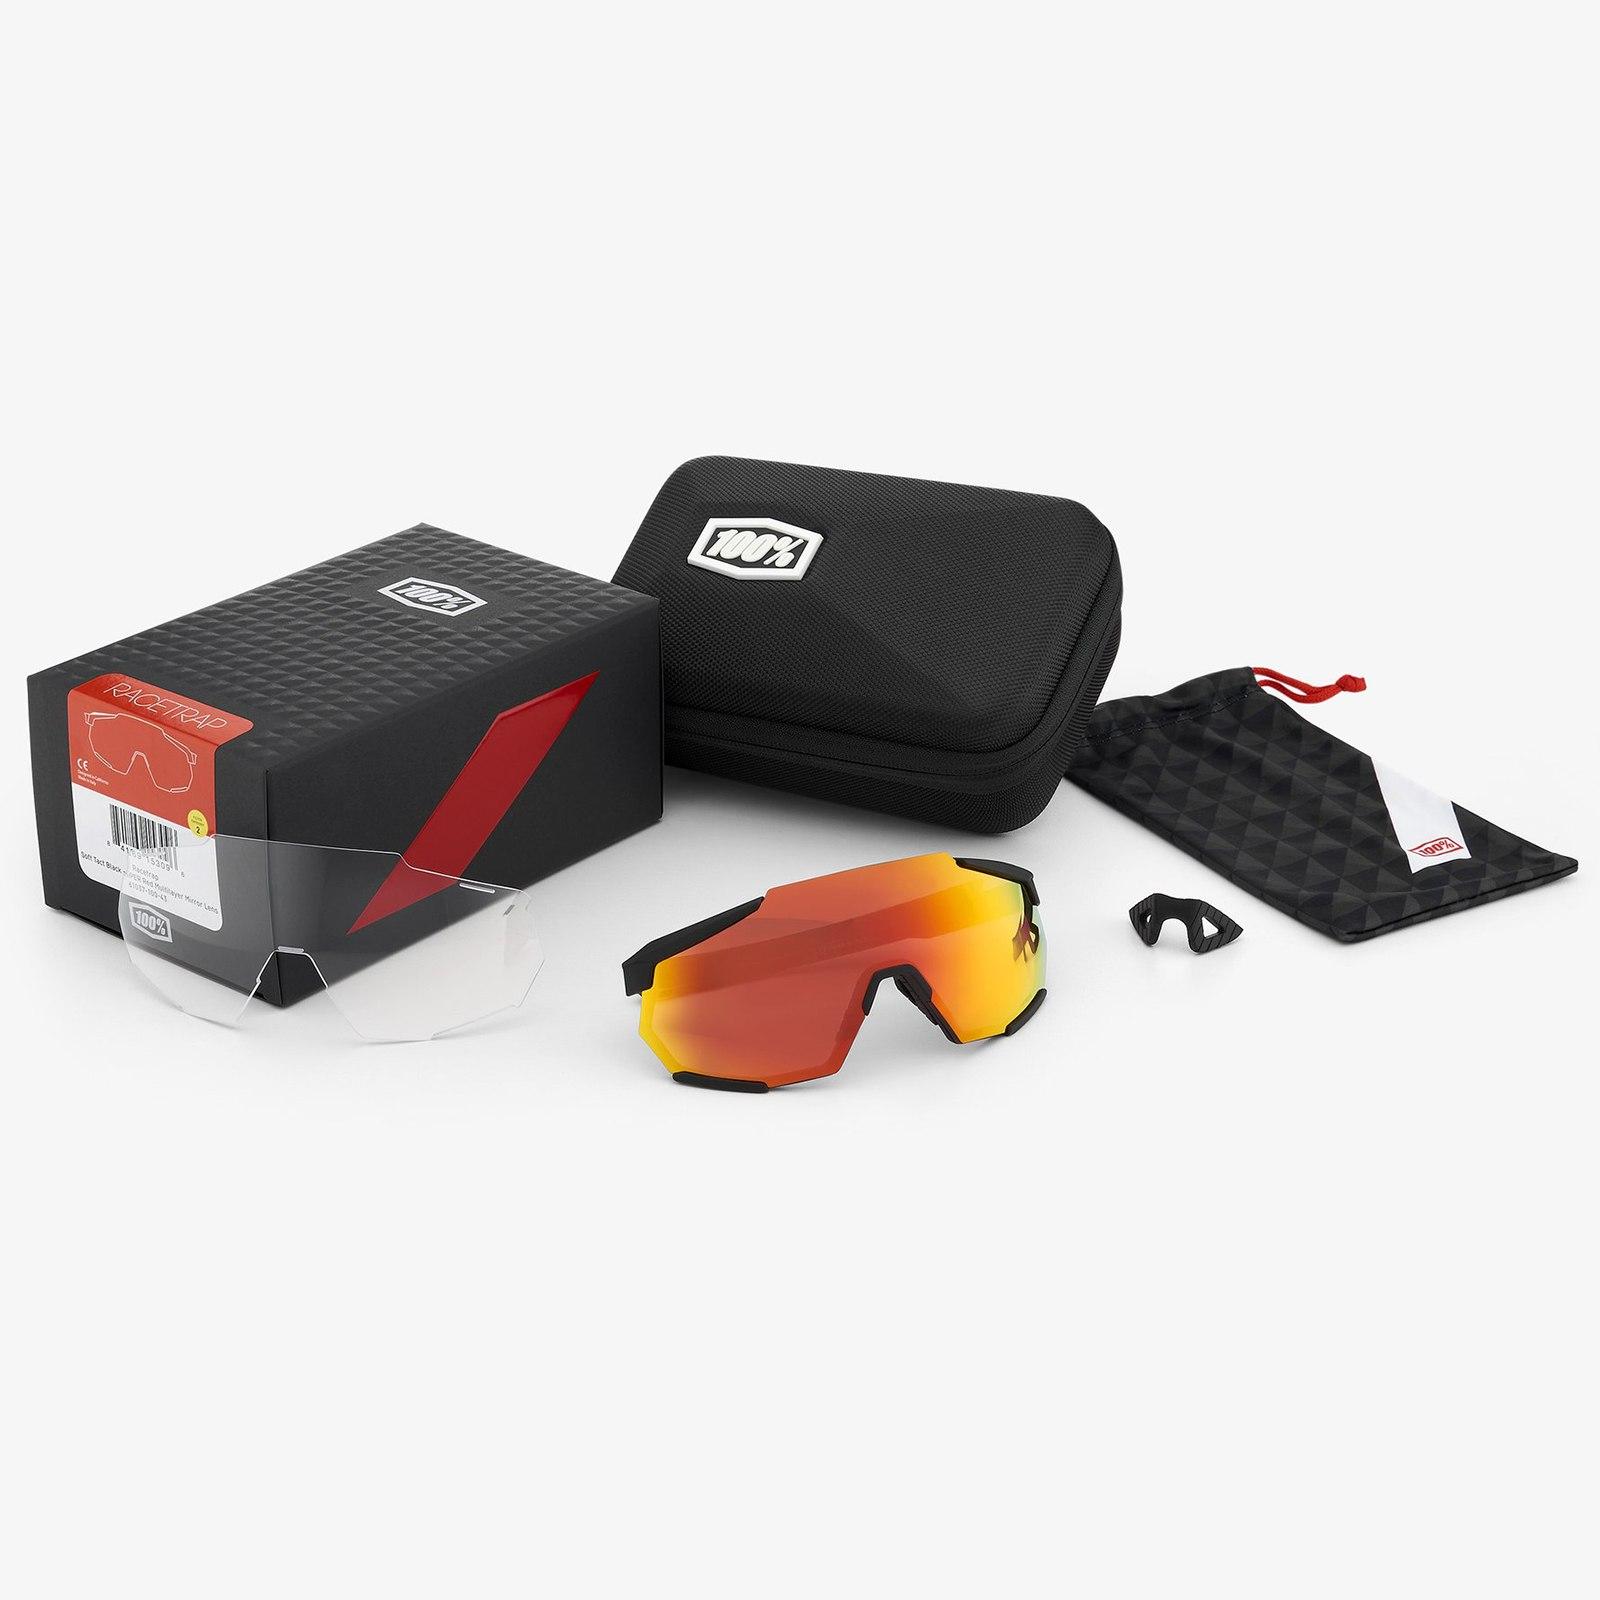 Imagen de 100% Racetrap HiPER Mirror Glasses - Soft Tact Black/Red Multilayer + Clear